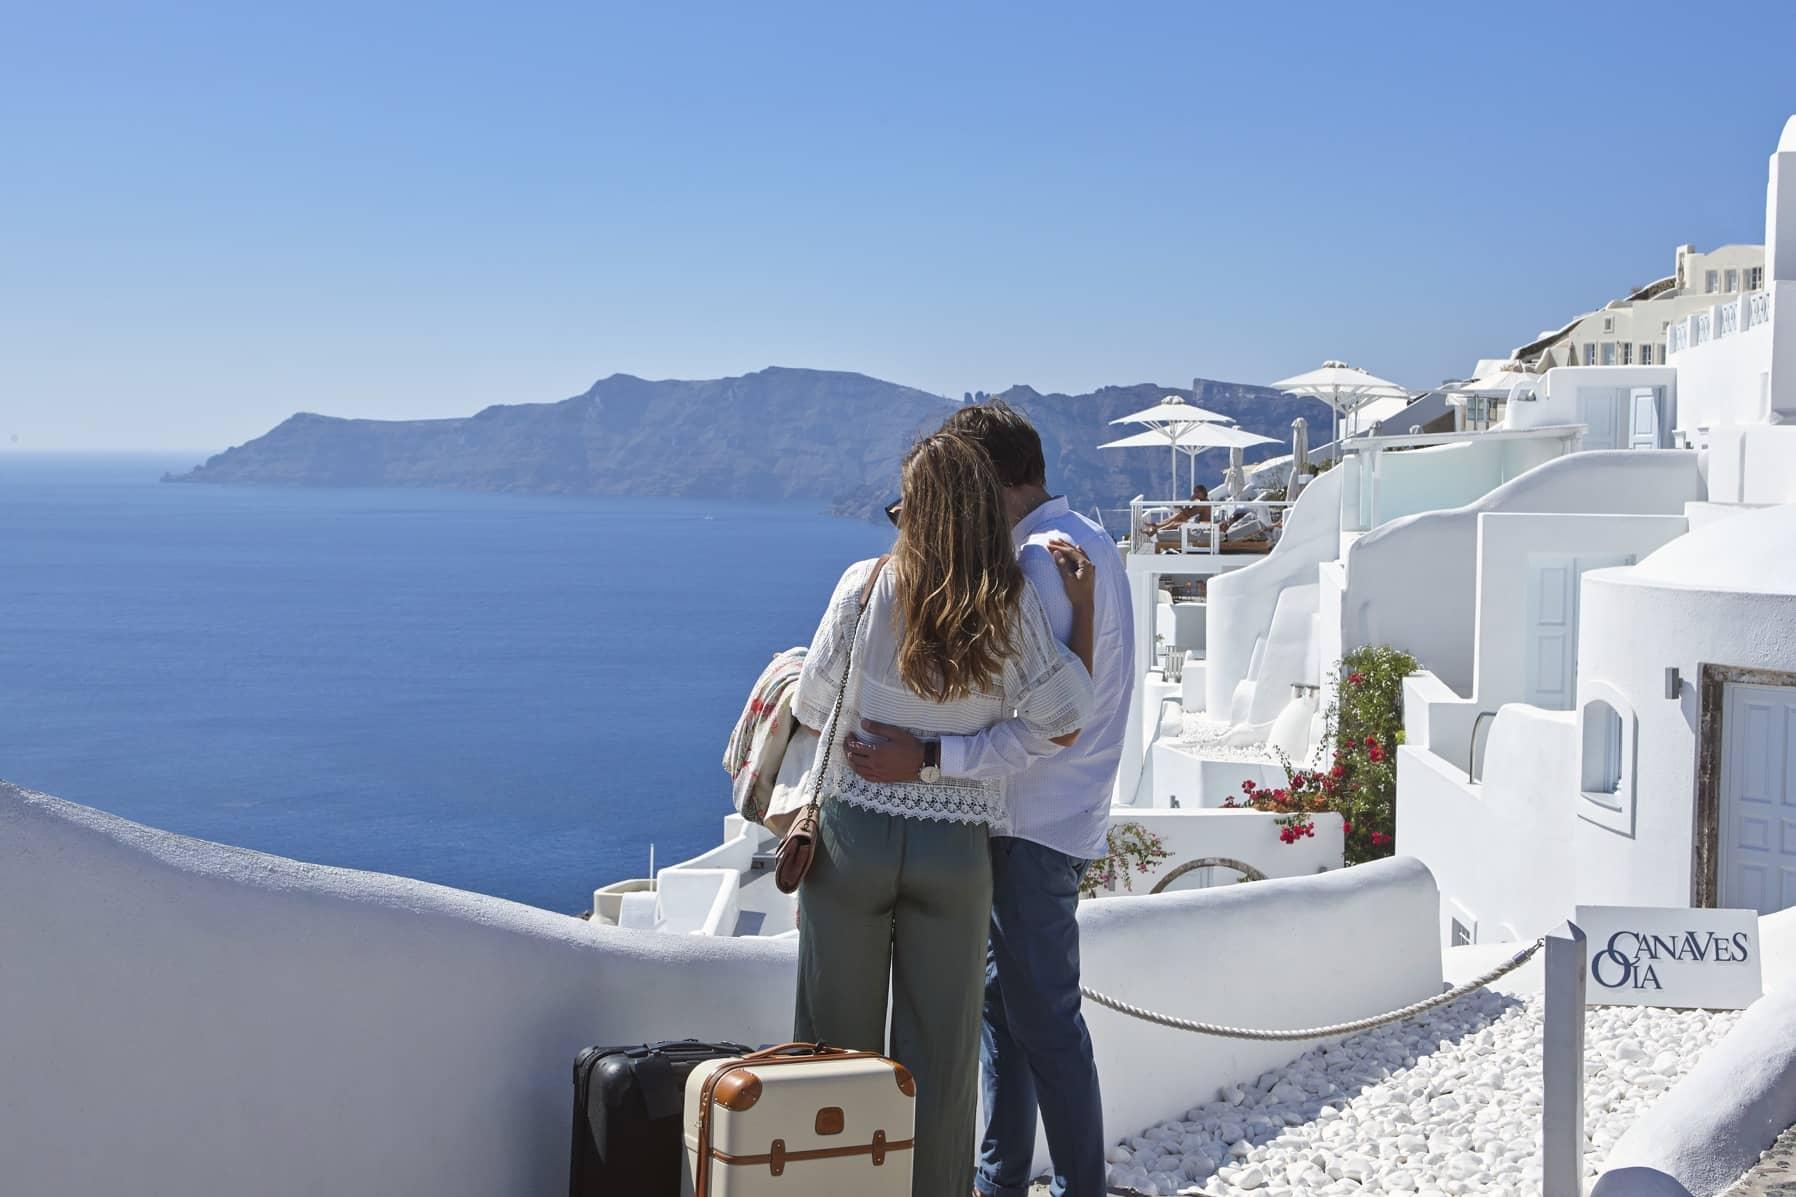 Canaves-Oia-Hotel-Erwachsenenhotel Griechenland